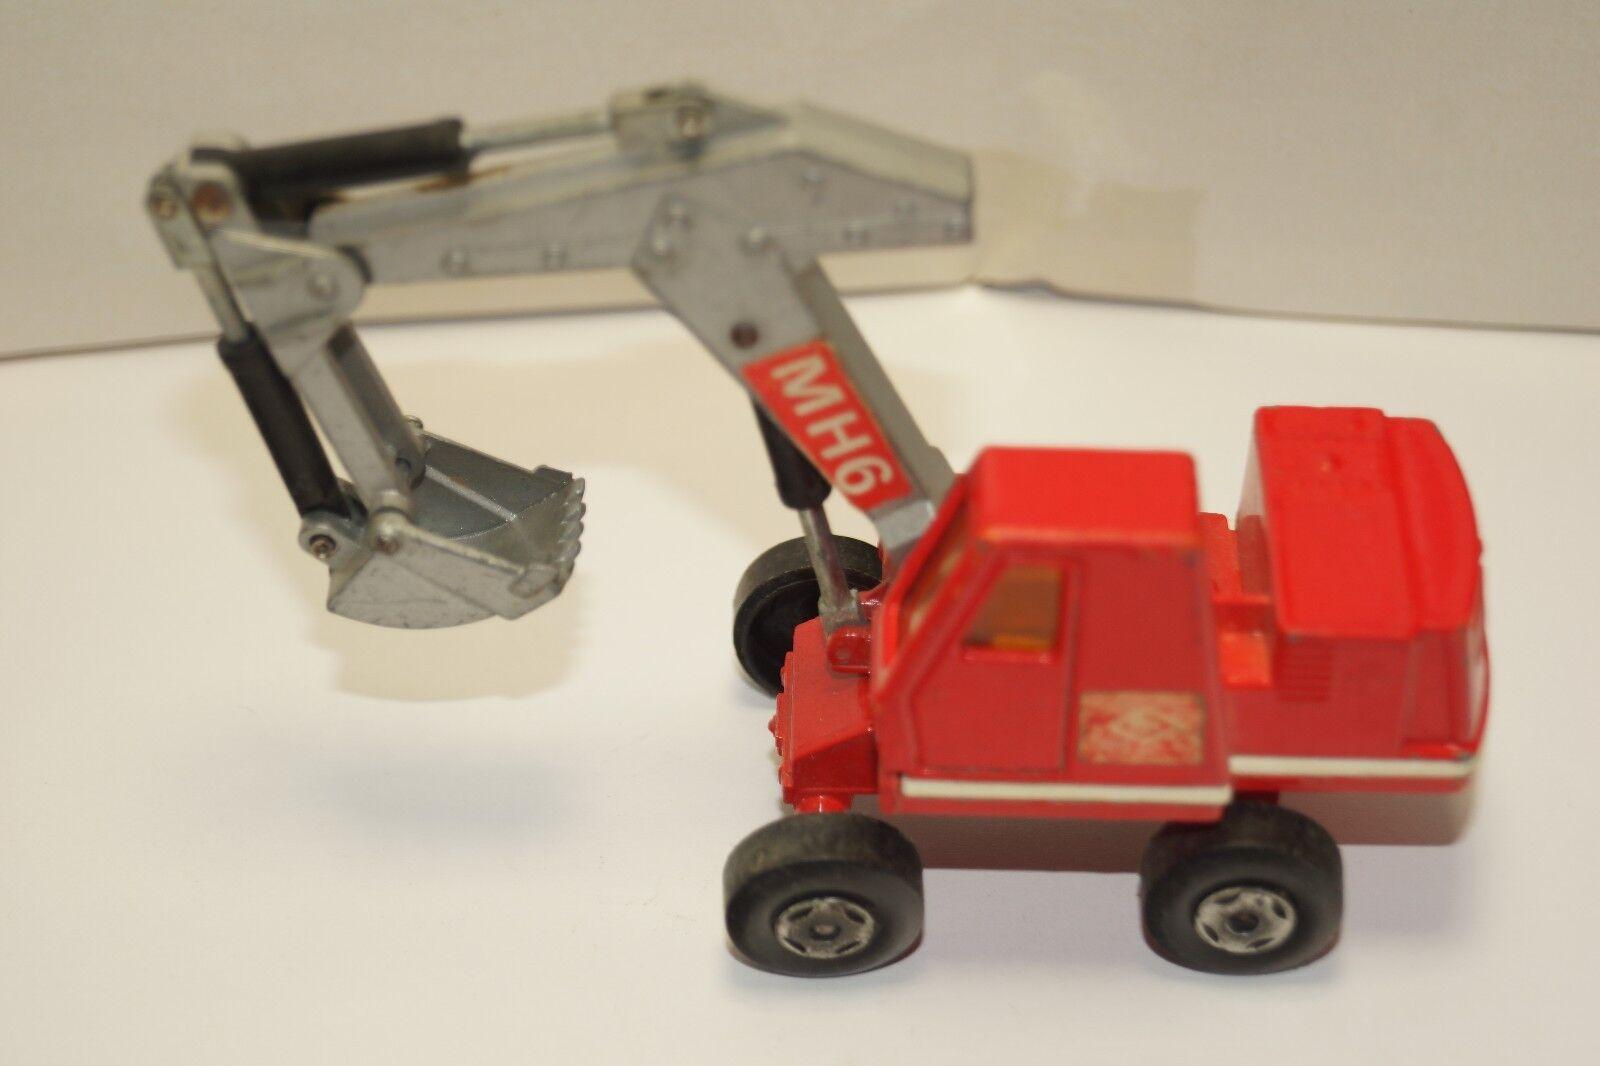 ORIGINAL MatchBox - KINGGröße - No K1 - Hydraulic Excavator - rot Farbe